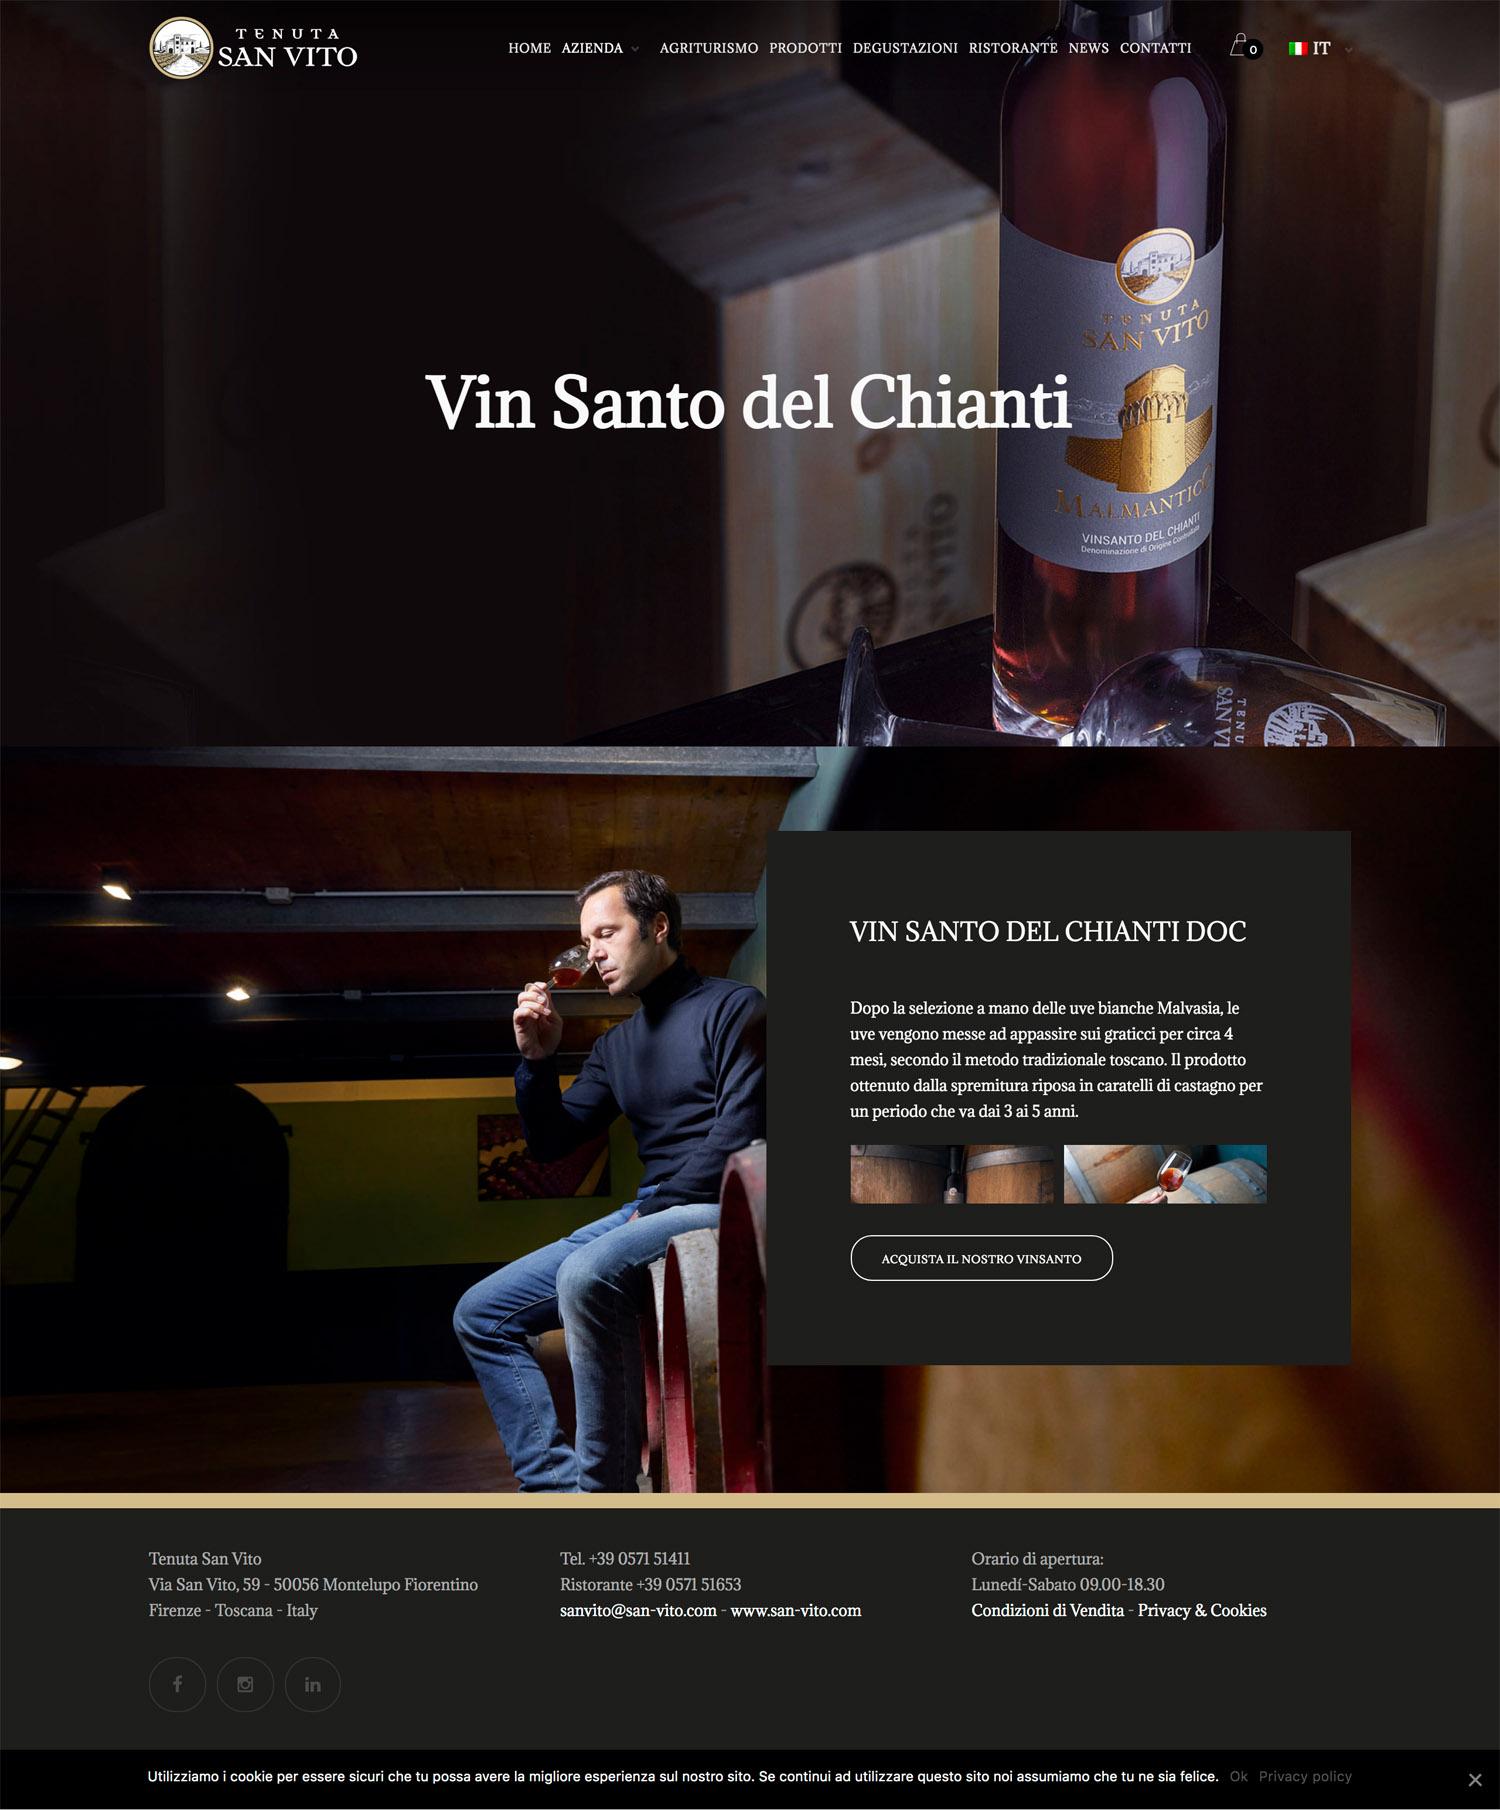 Sito Internet Ecommerce Vino Agriturismo Toscana San Vito